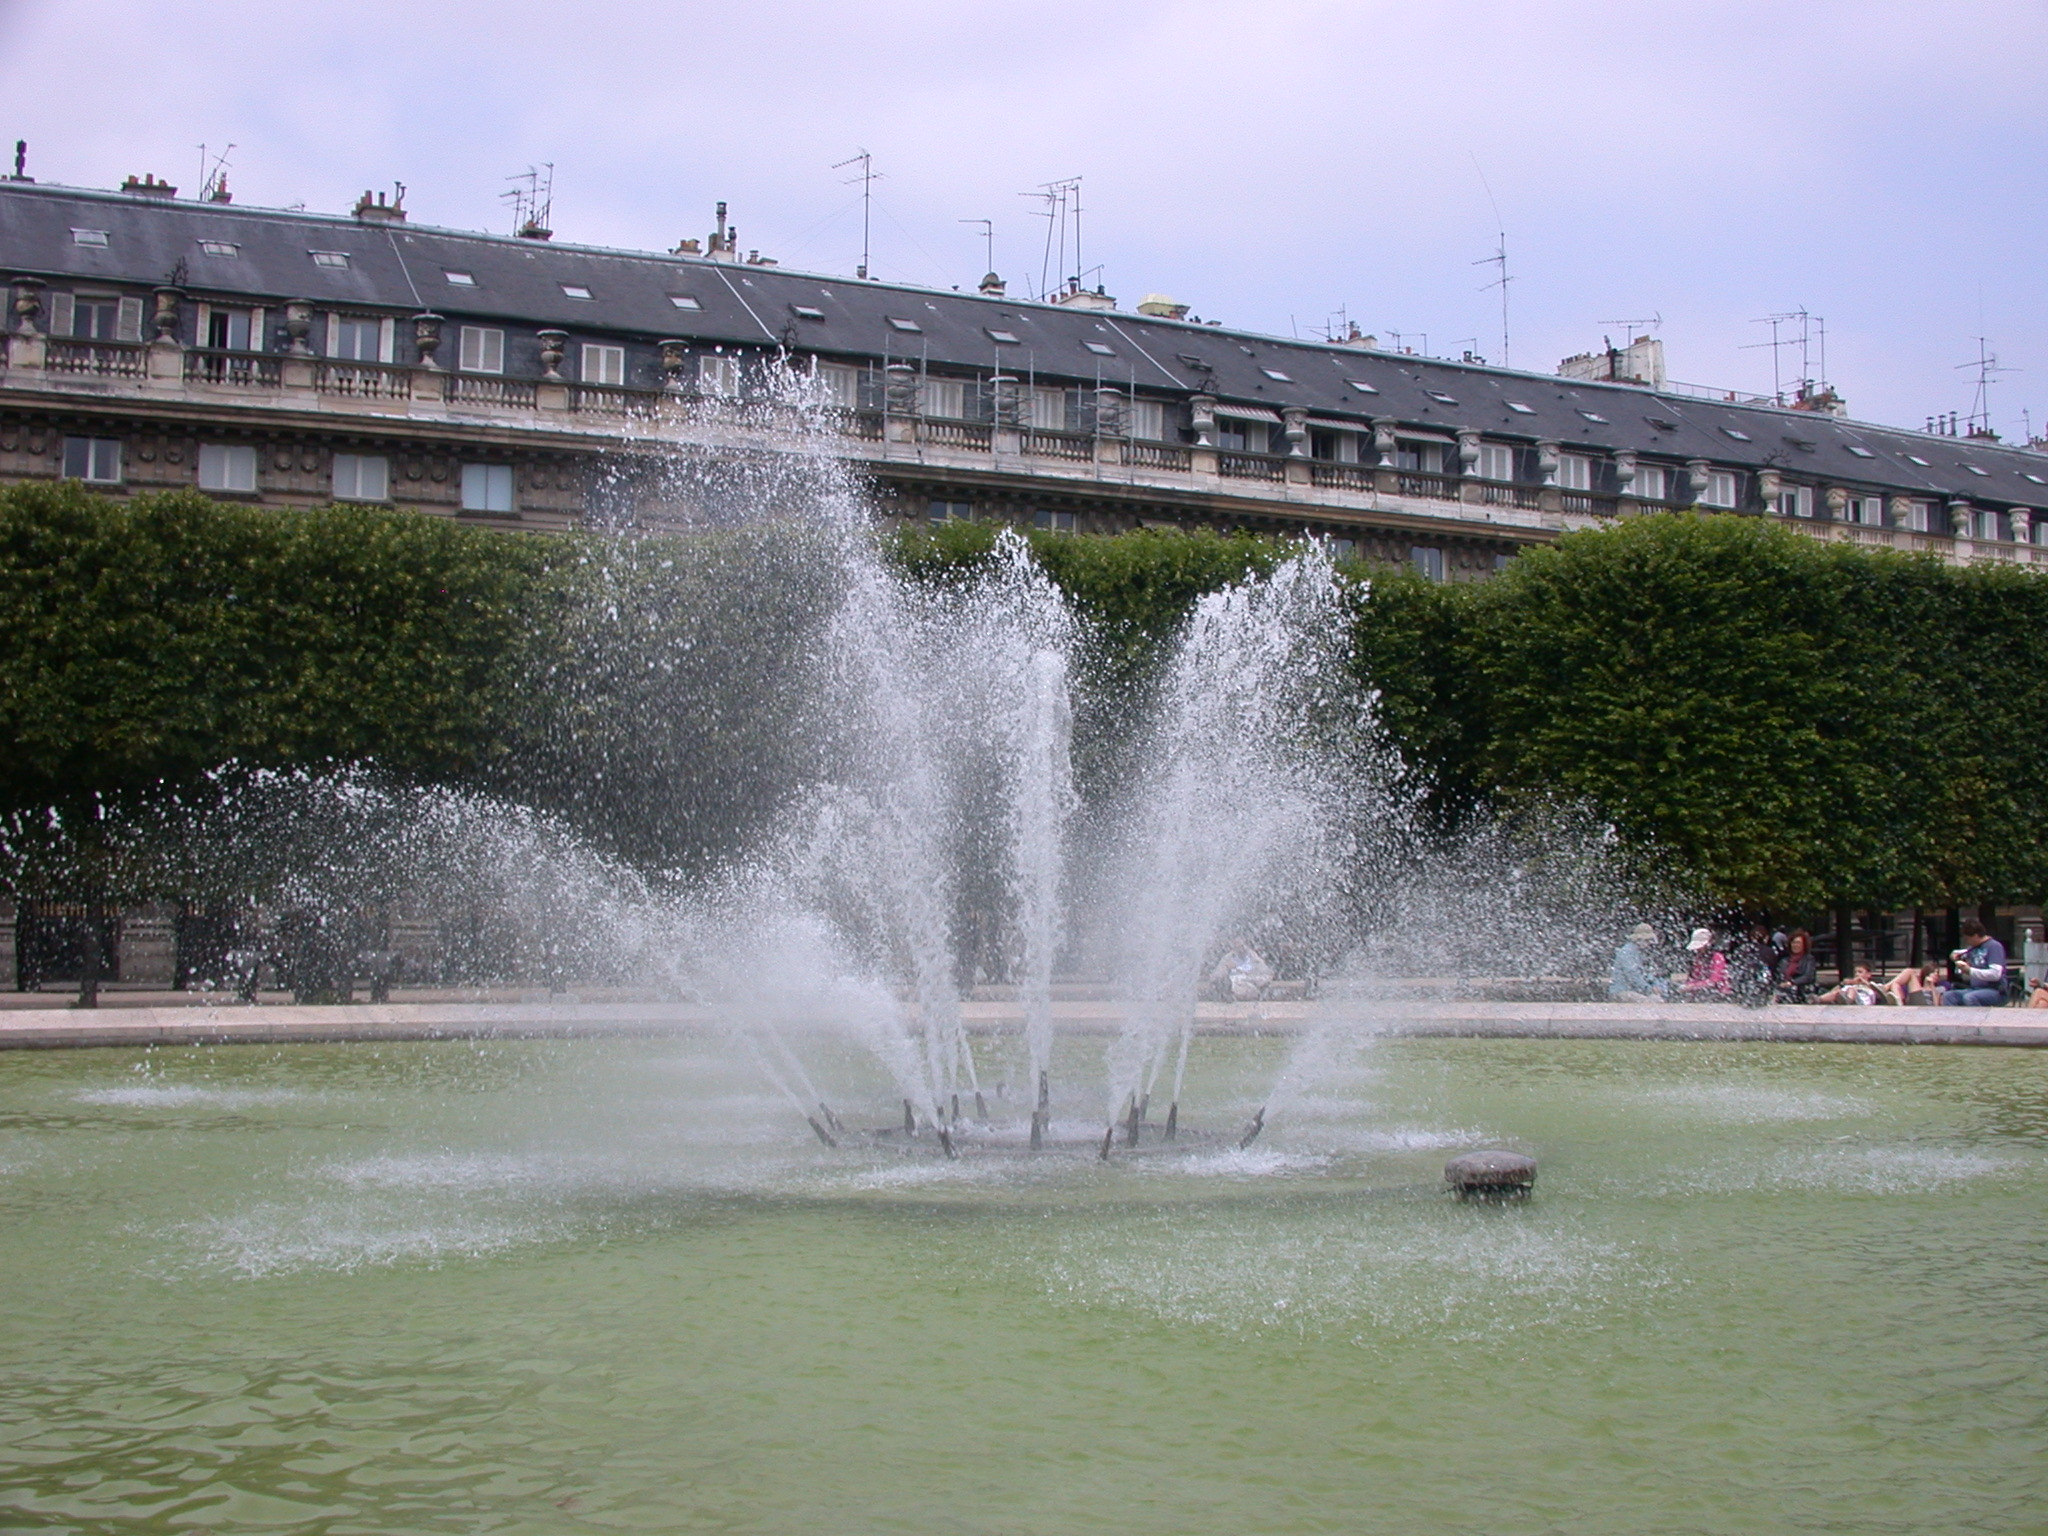 Day 4 in Paris